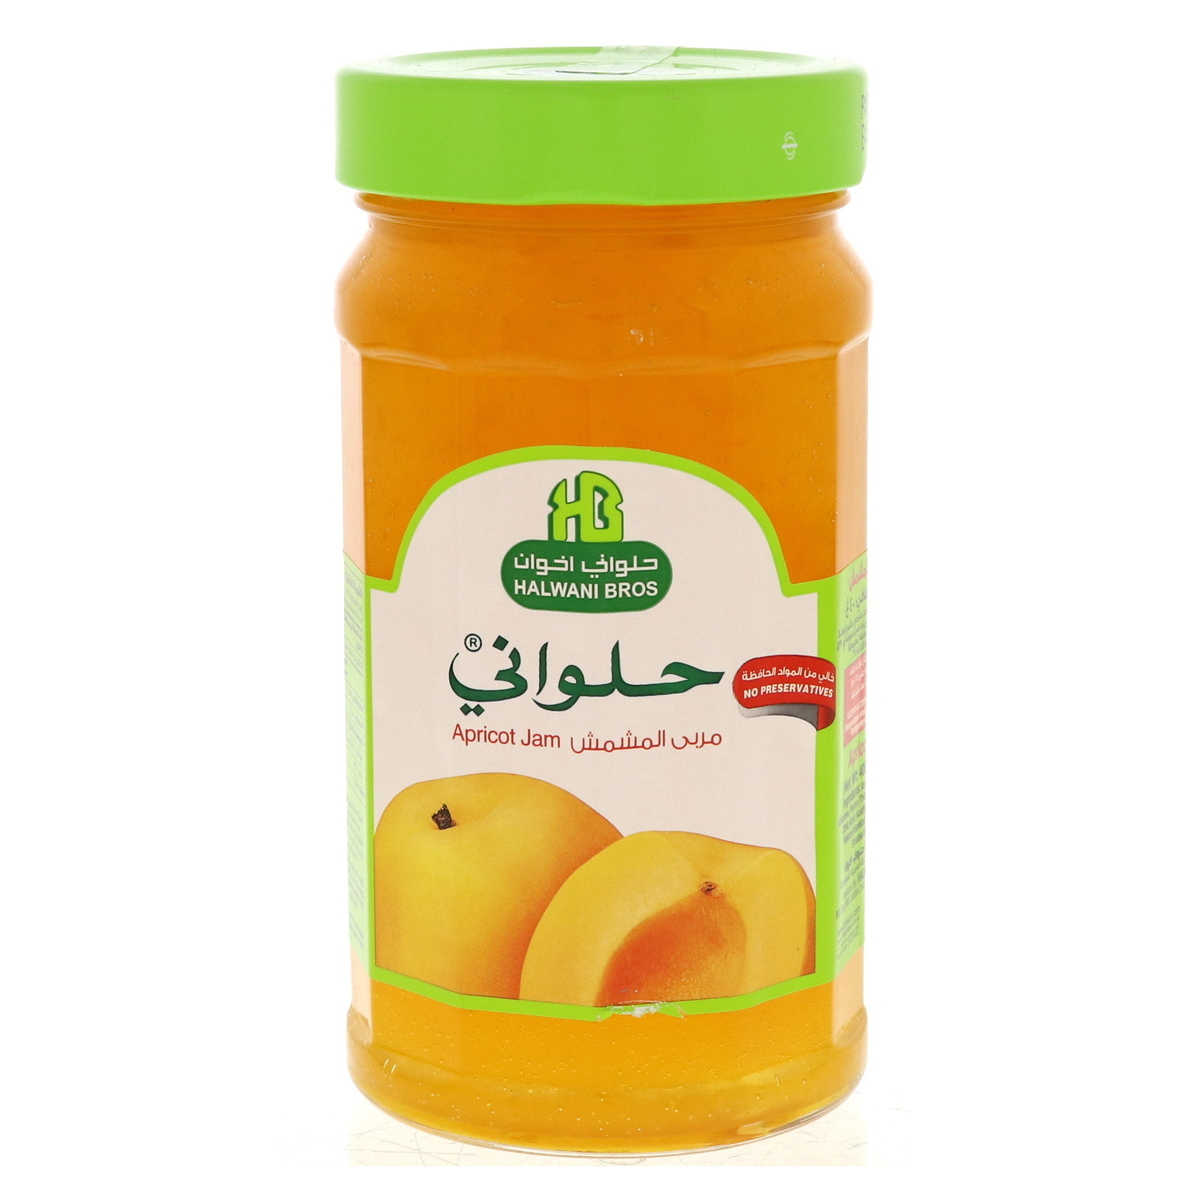 Buy Halwani Apricot Jam 400g - Jams - Lulu Webstore BAHRAIN